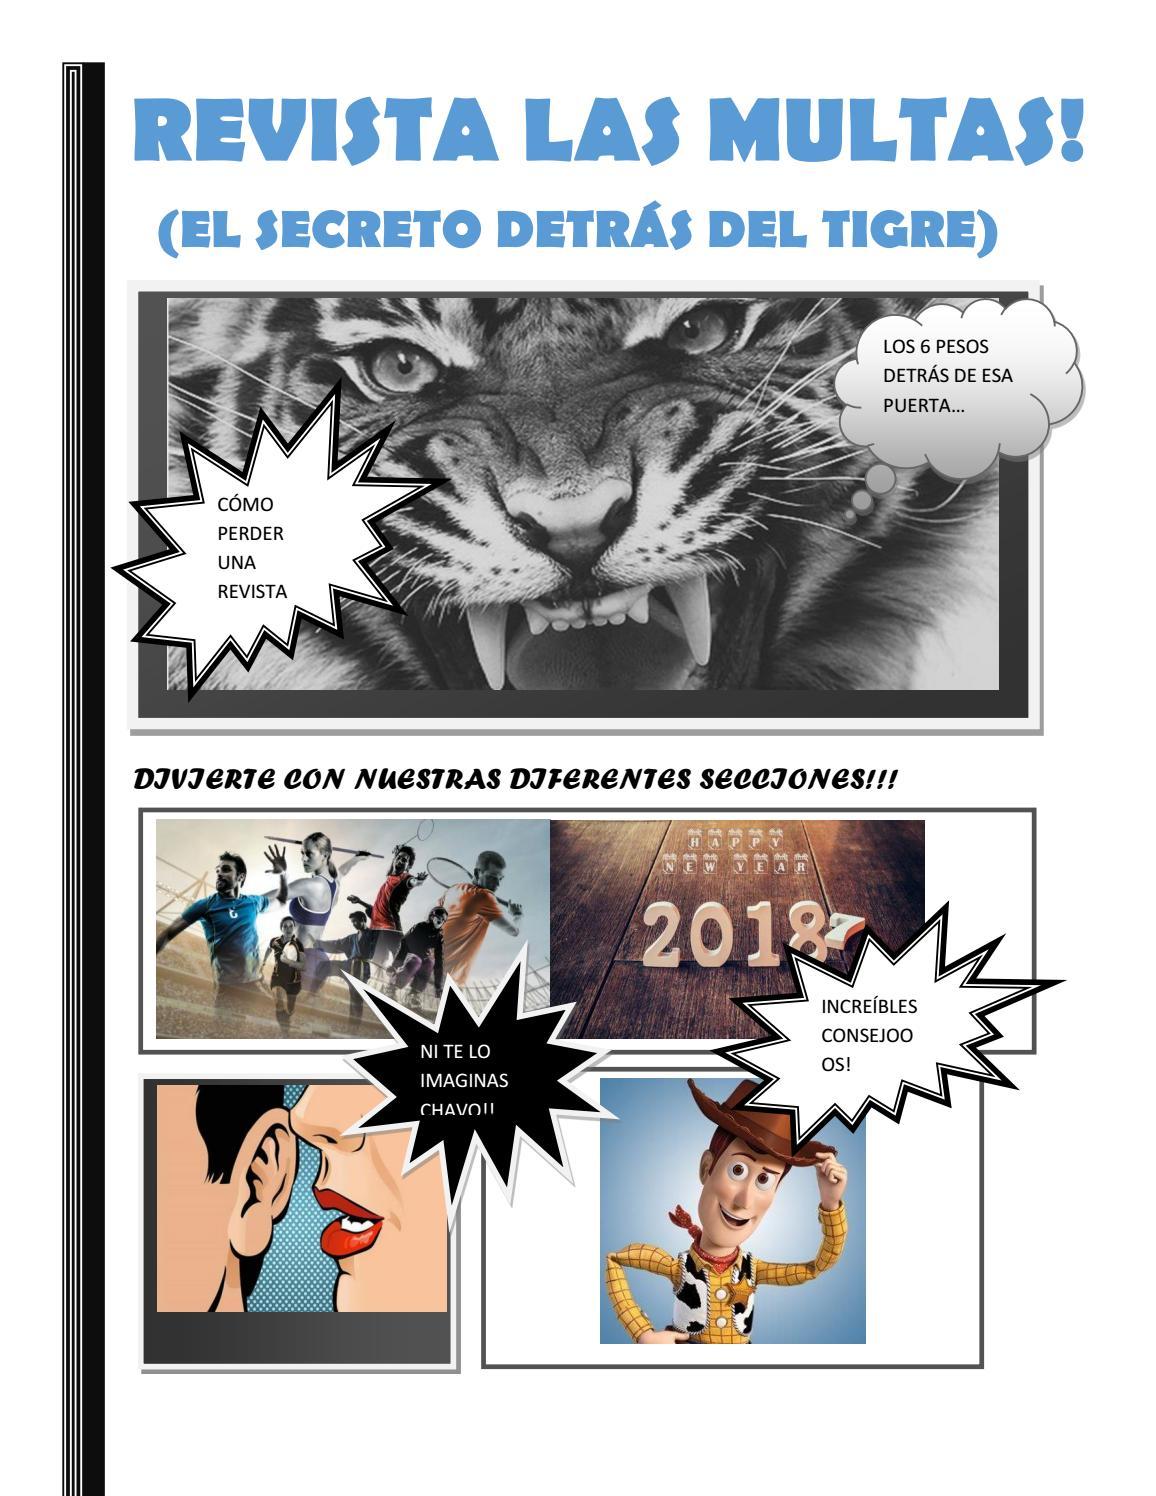 revista las multas by Keyla Hau - issuu